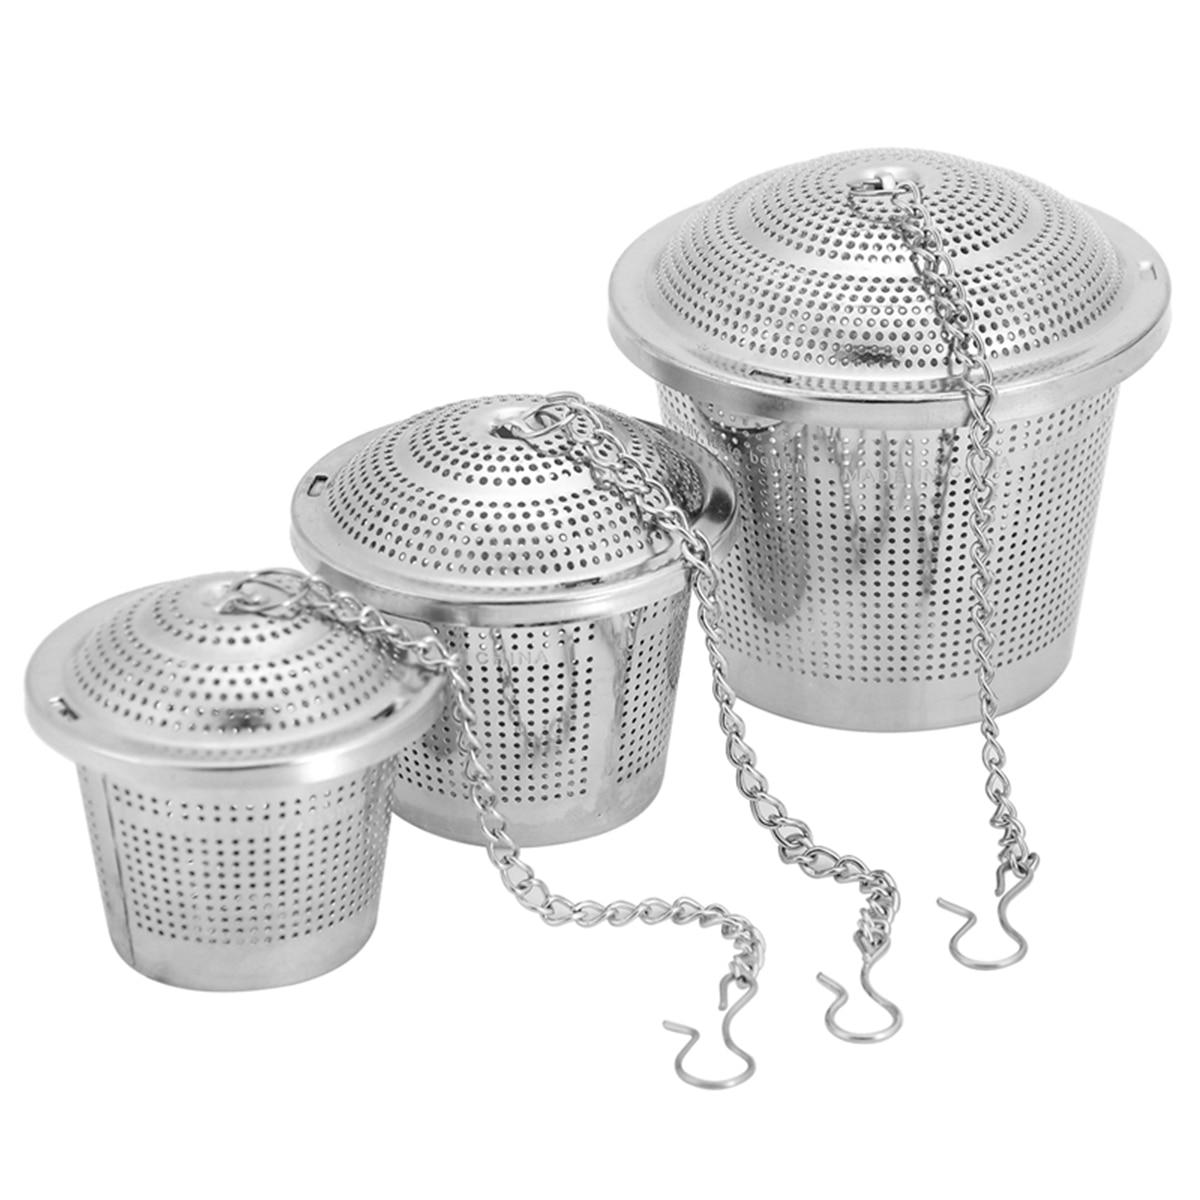 1Pc  Reusable Tea Infuser  Locking Spice Tea Ball Stainless Steel Multifunction Mesh Herbal Ball Tea Spice Strainer